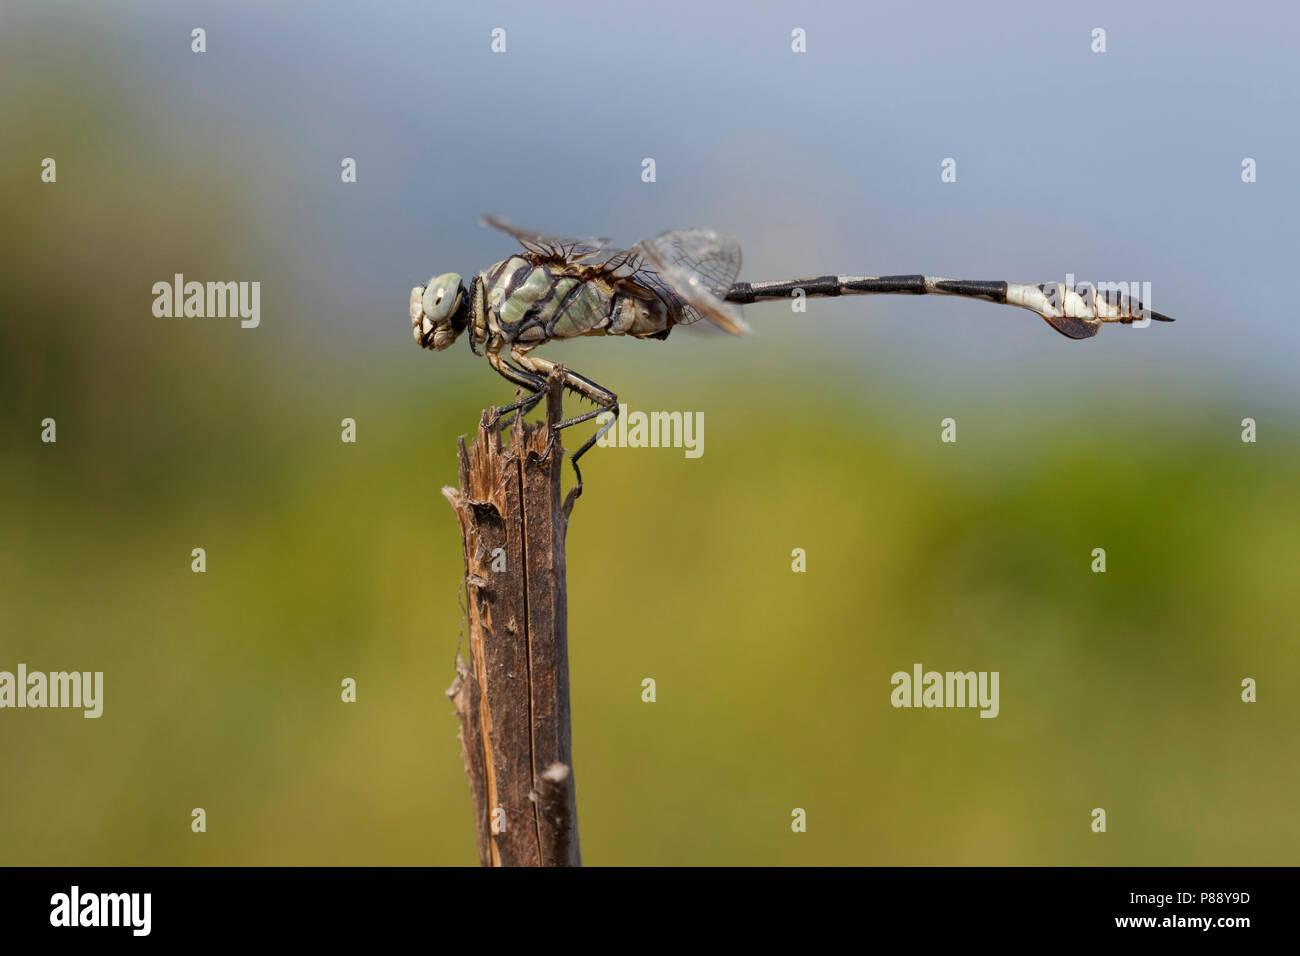 Imago Vaandeldrager; Bladetail adulti; Immagini Stock